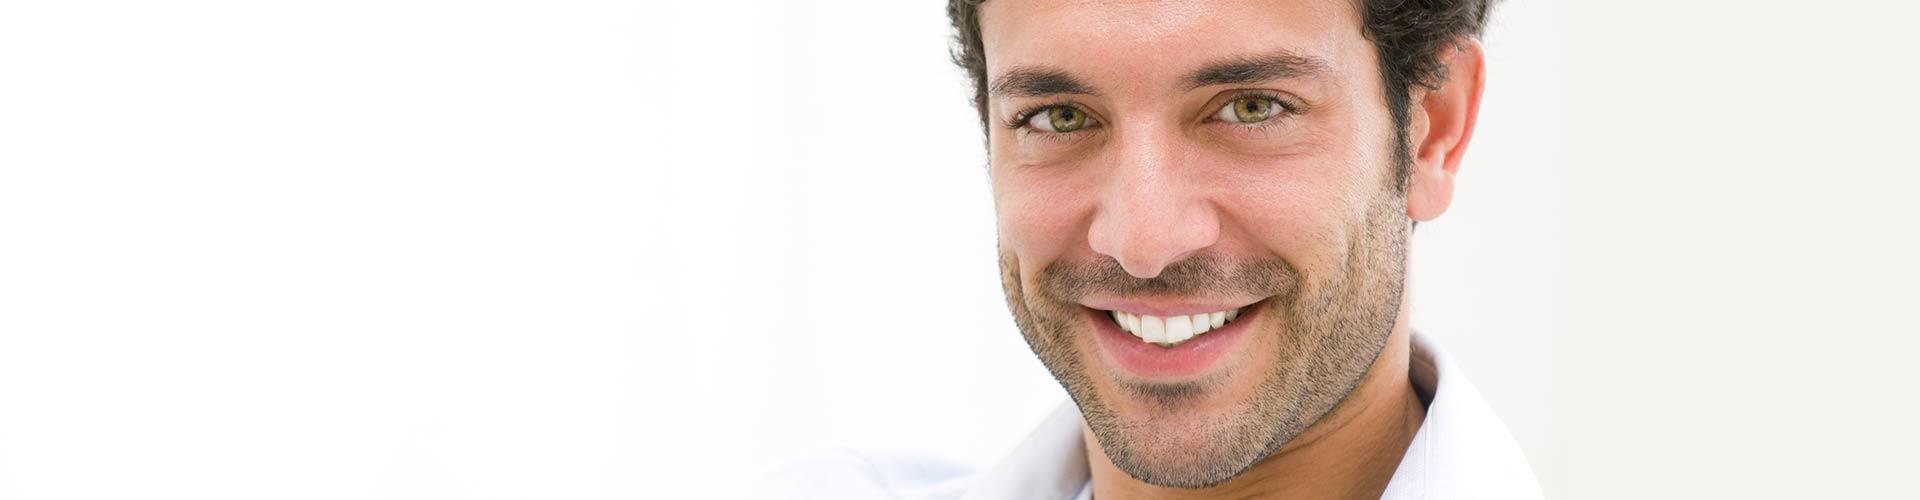 Teeth Whitening in Seattle, Ballard, WA, Shoreline, Fremont, WA, Northgate, WA